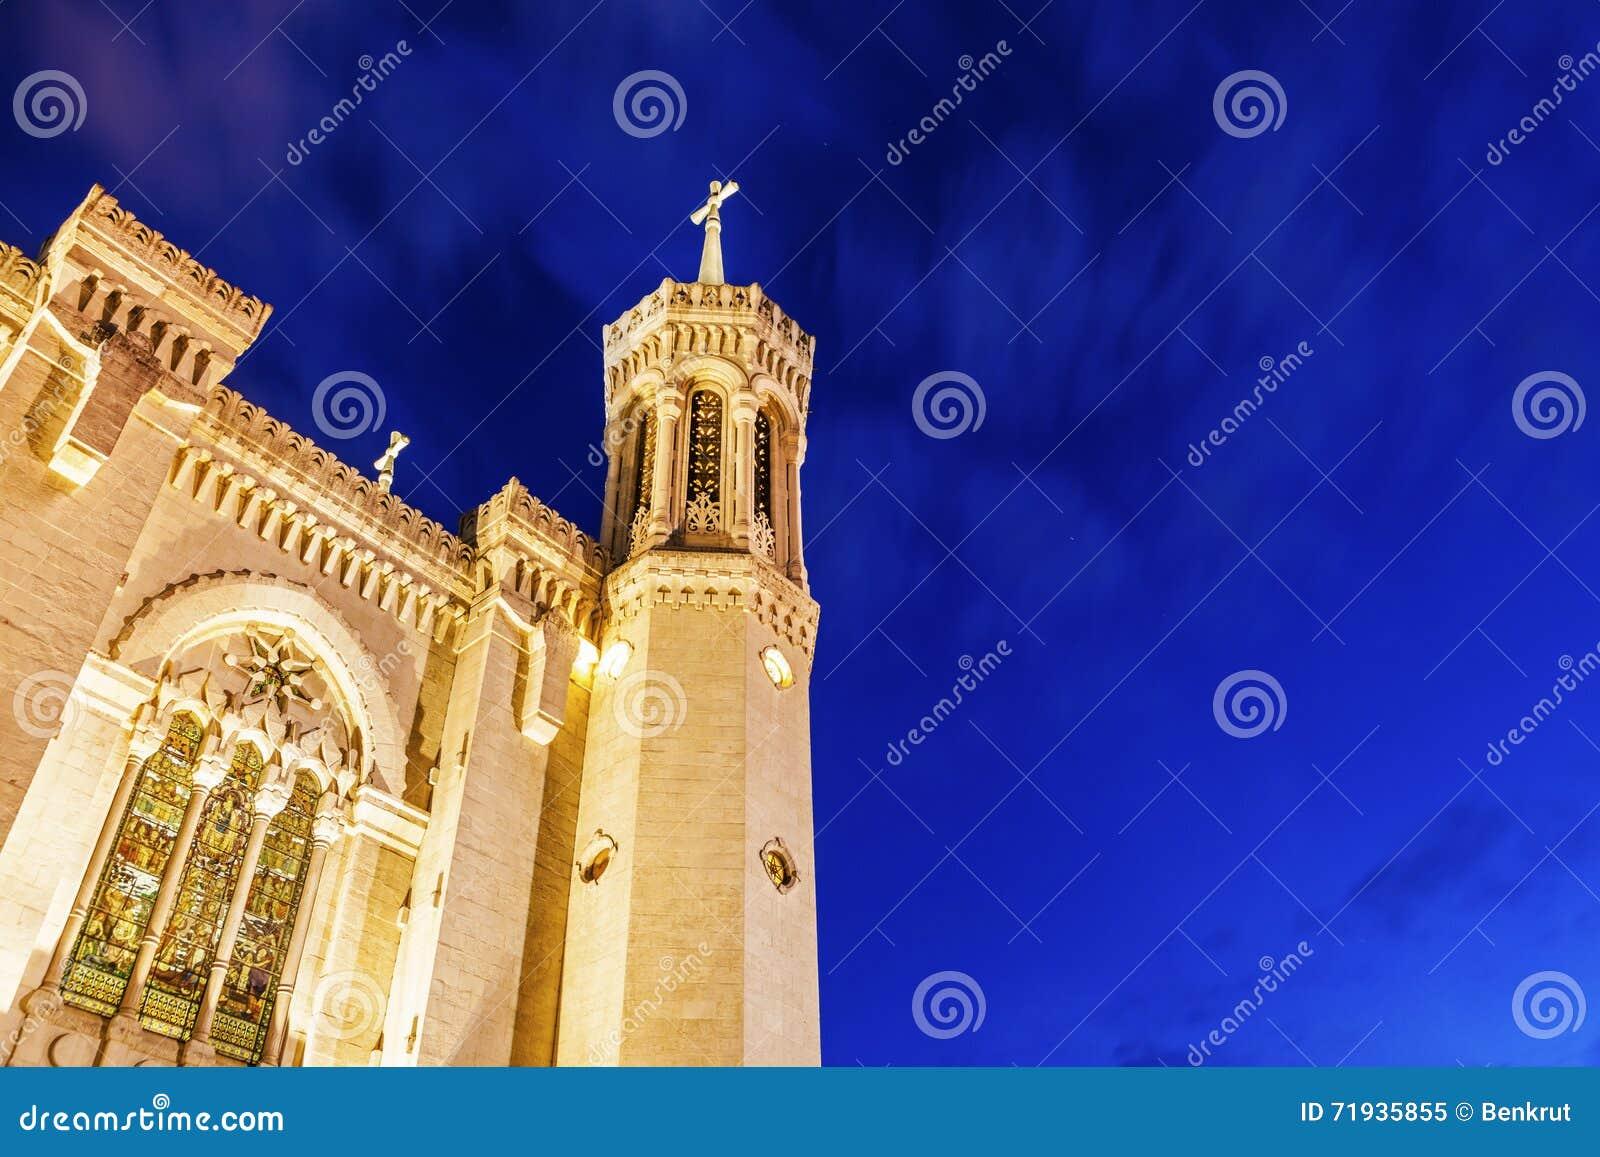 Notre базилики dame de fourviere lyon